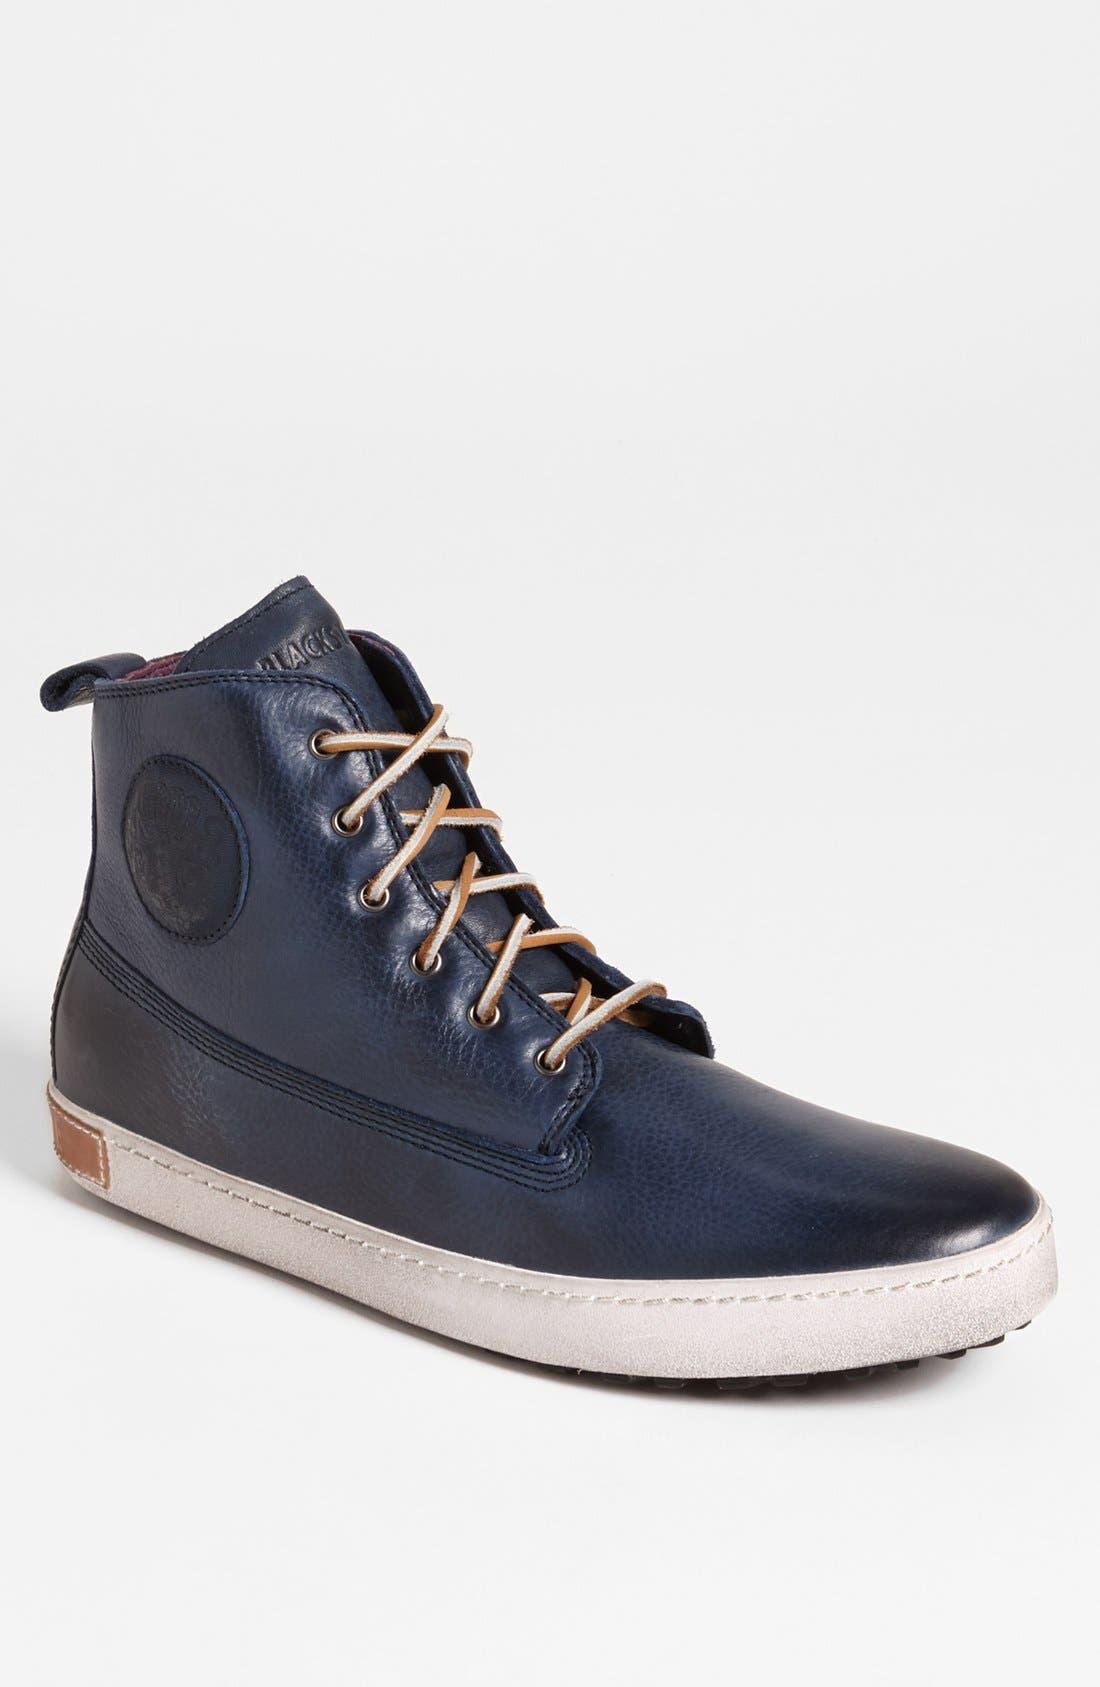 Main Image - Blackstone 'AM 02' High Top Sneaker